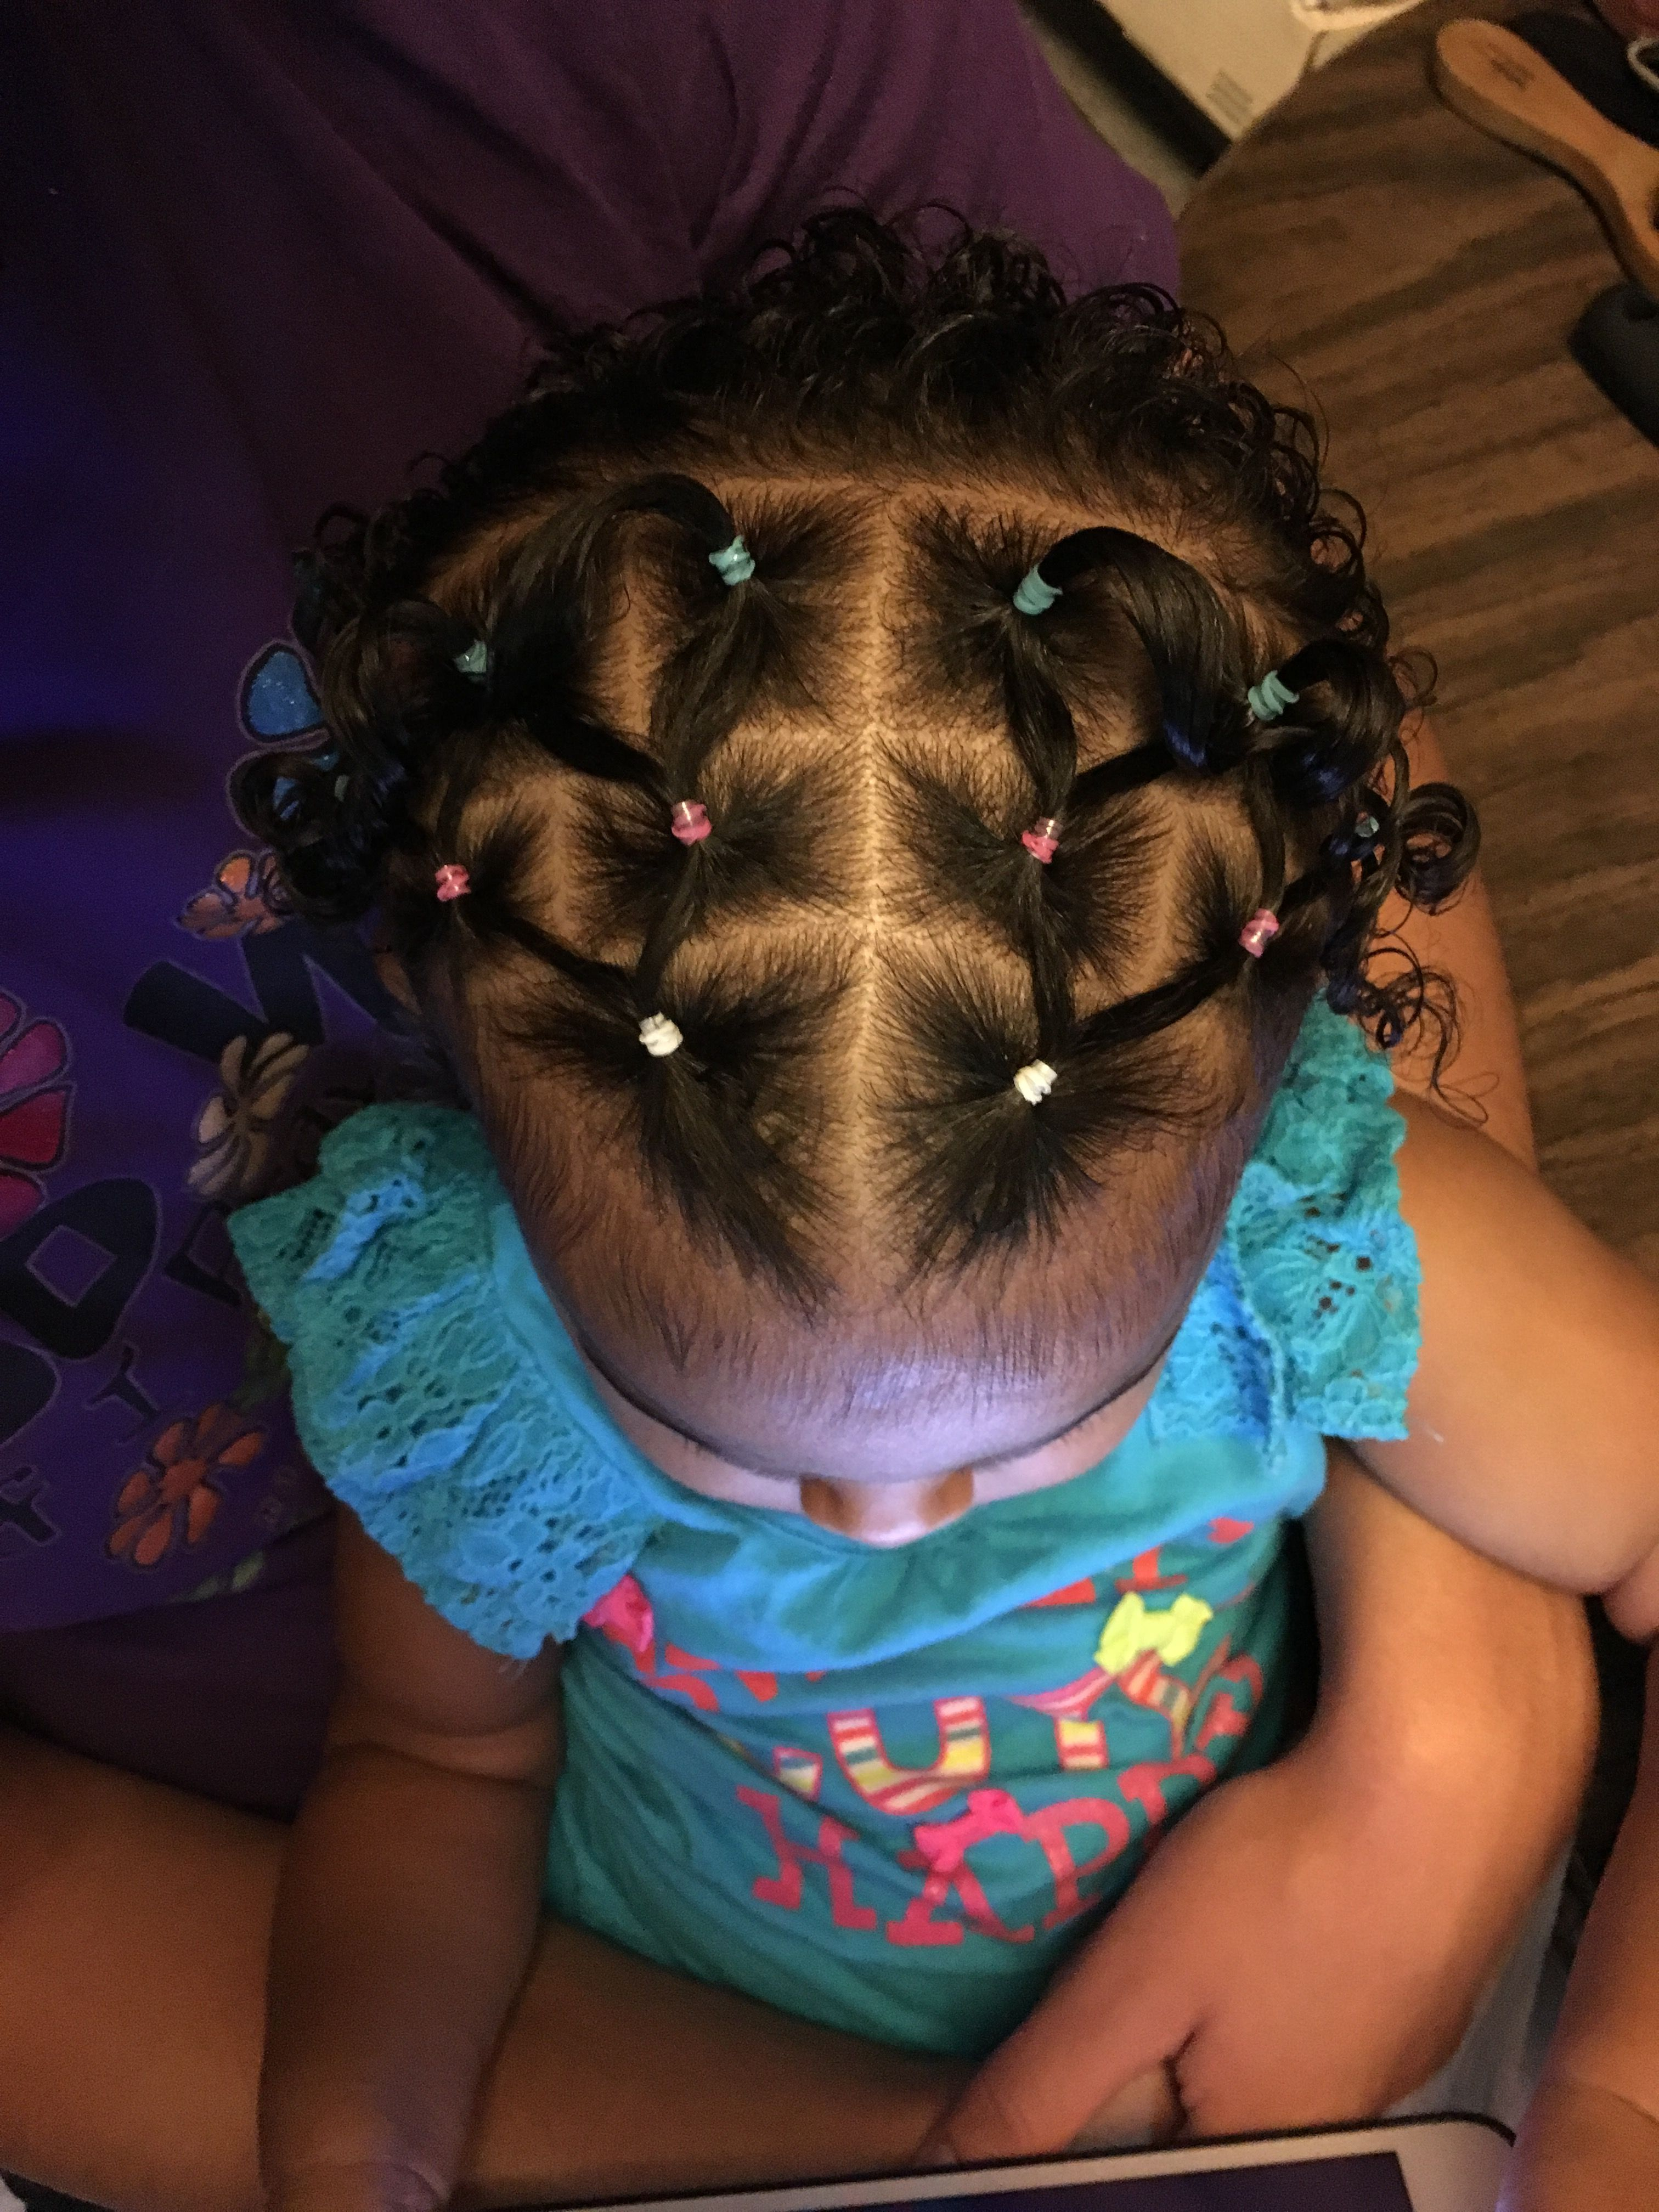 Hairstyle For Toddler Little Girl Hair Toddler Toddlerhair School Hairstyles Hairstylesfortoddle Kids Curly Hairstyles Baby Hairstyles Toddler Curly Hair